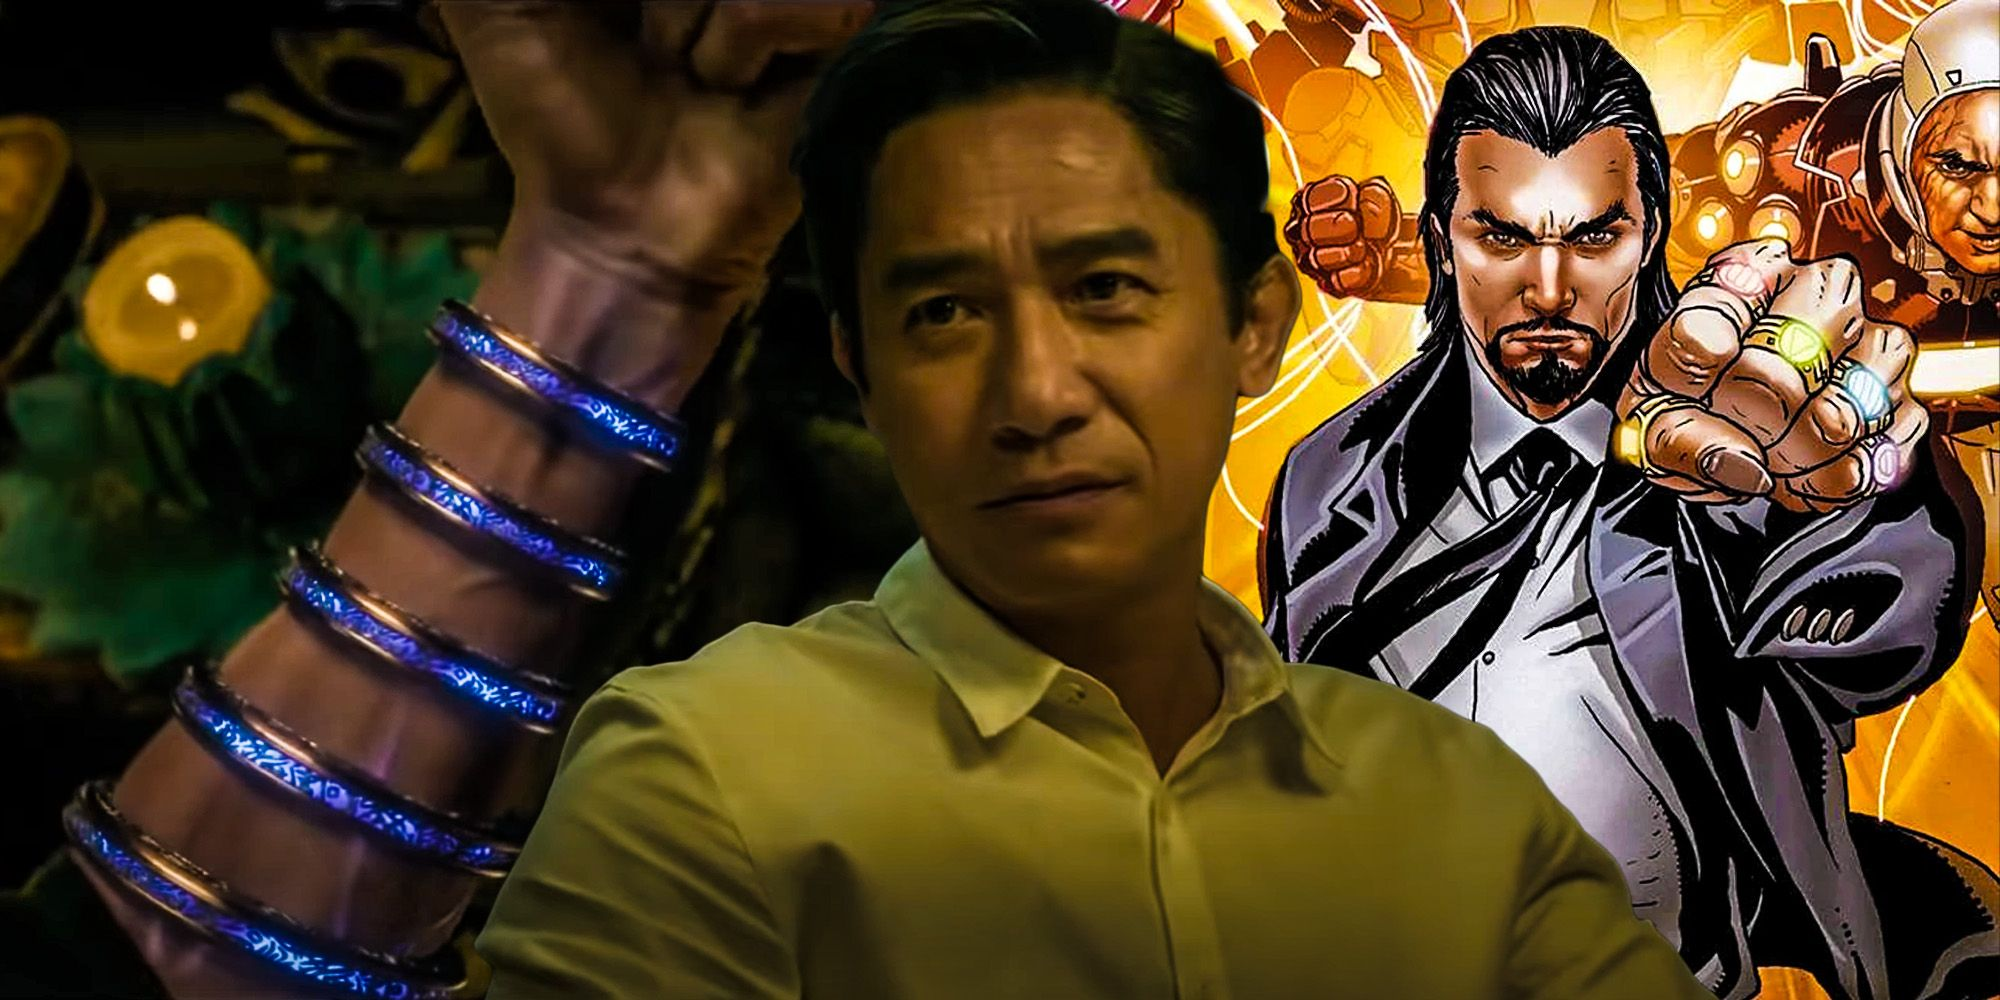 Shang-Chi: How Ten Rings' Powers Work In MCU & Marvel Comics